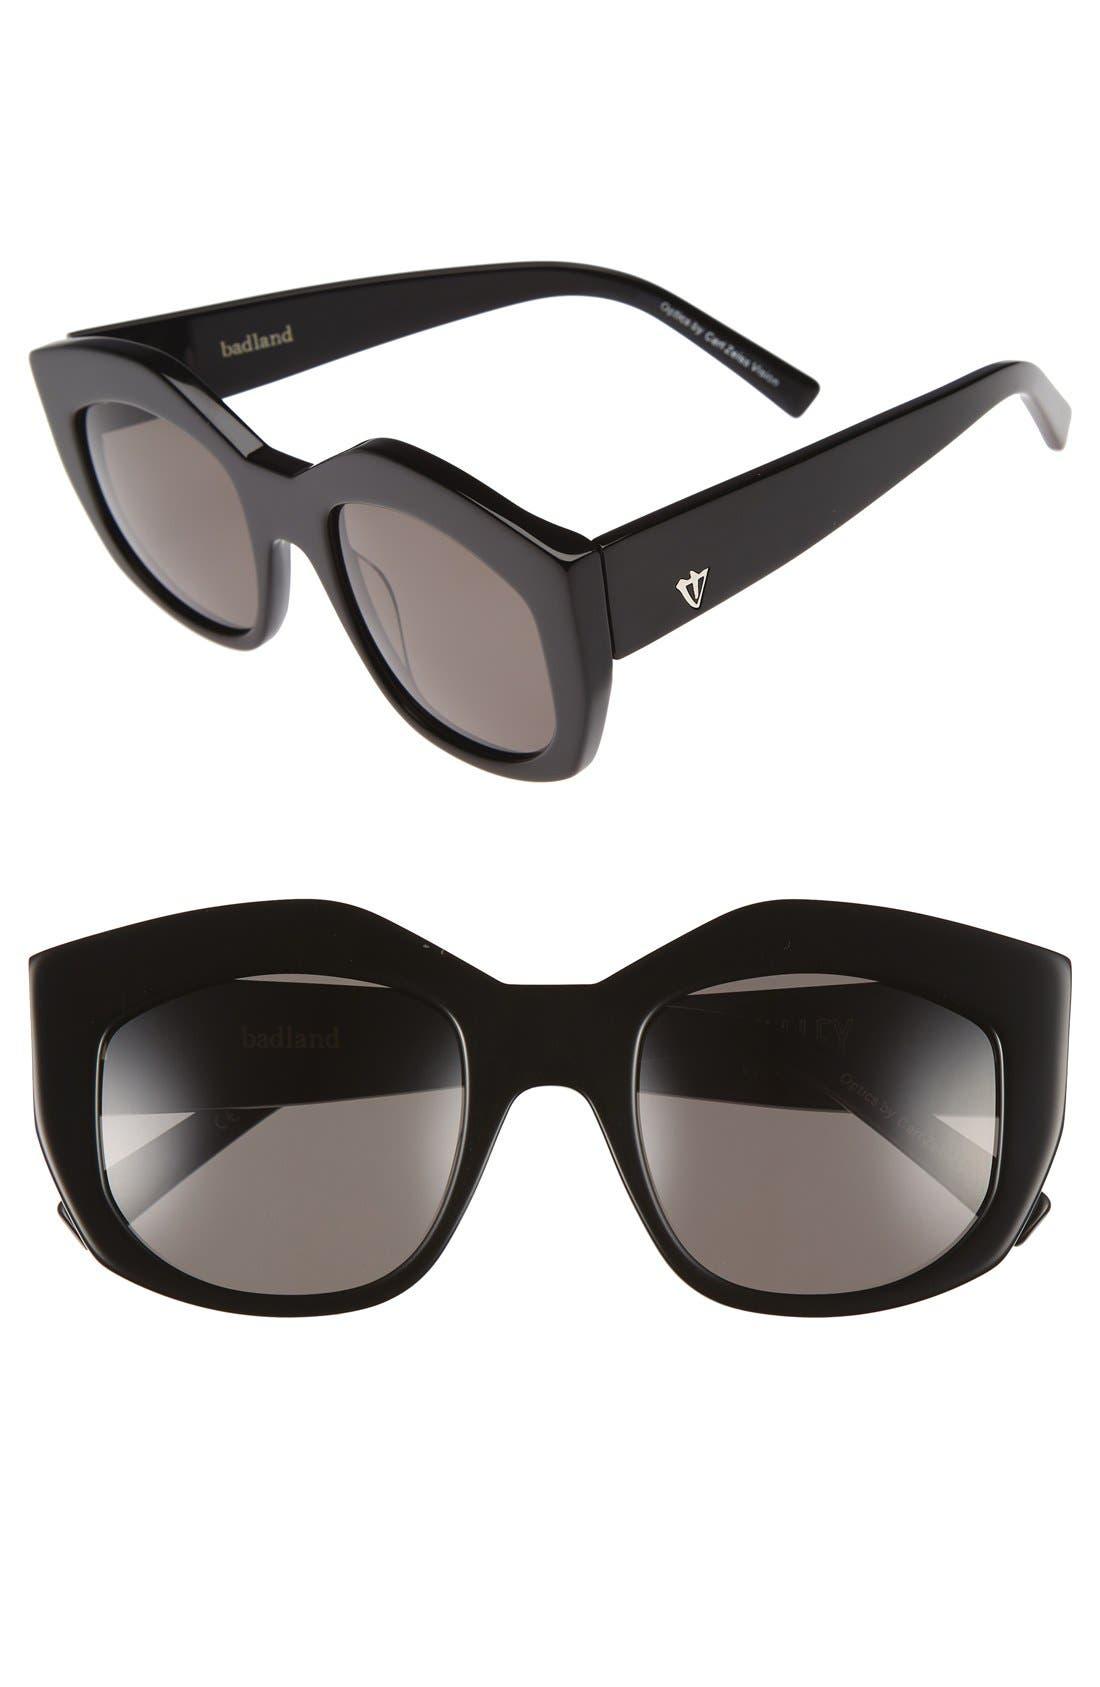 Main Image - VALLEY 50mm Badland Sunglasses